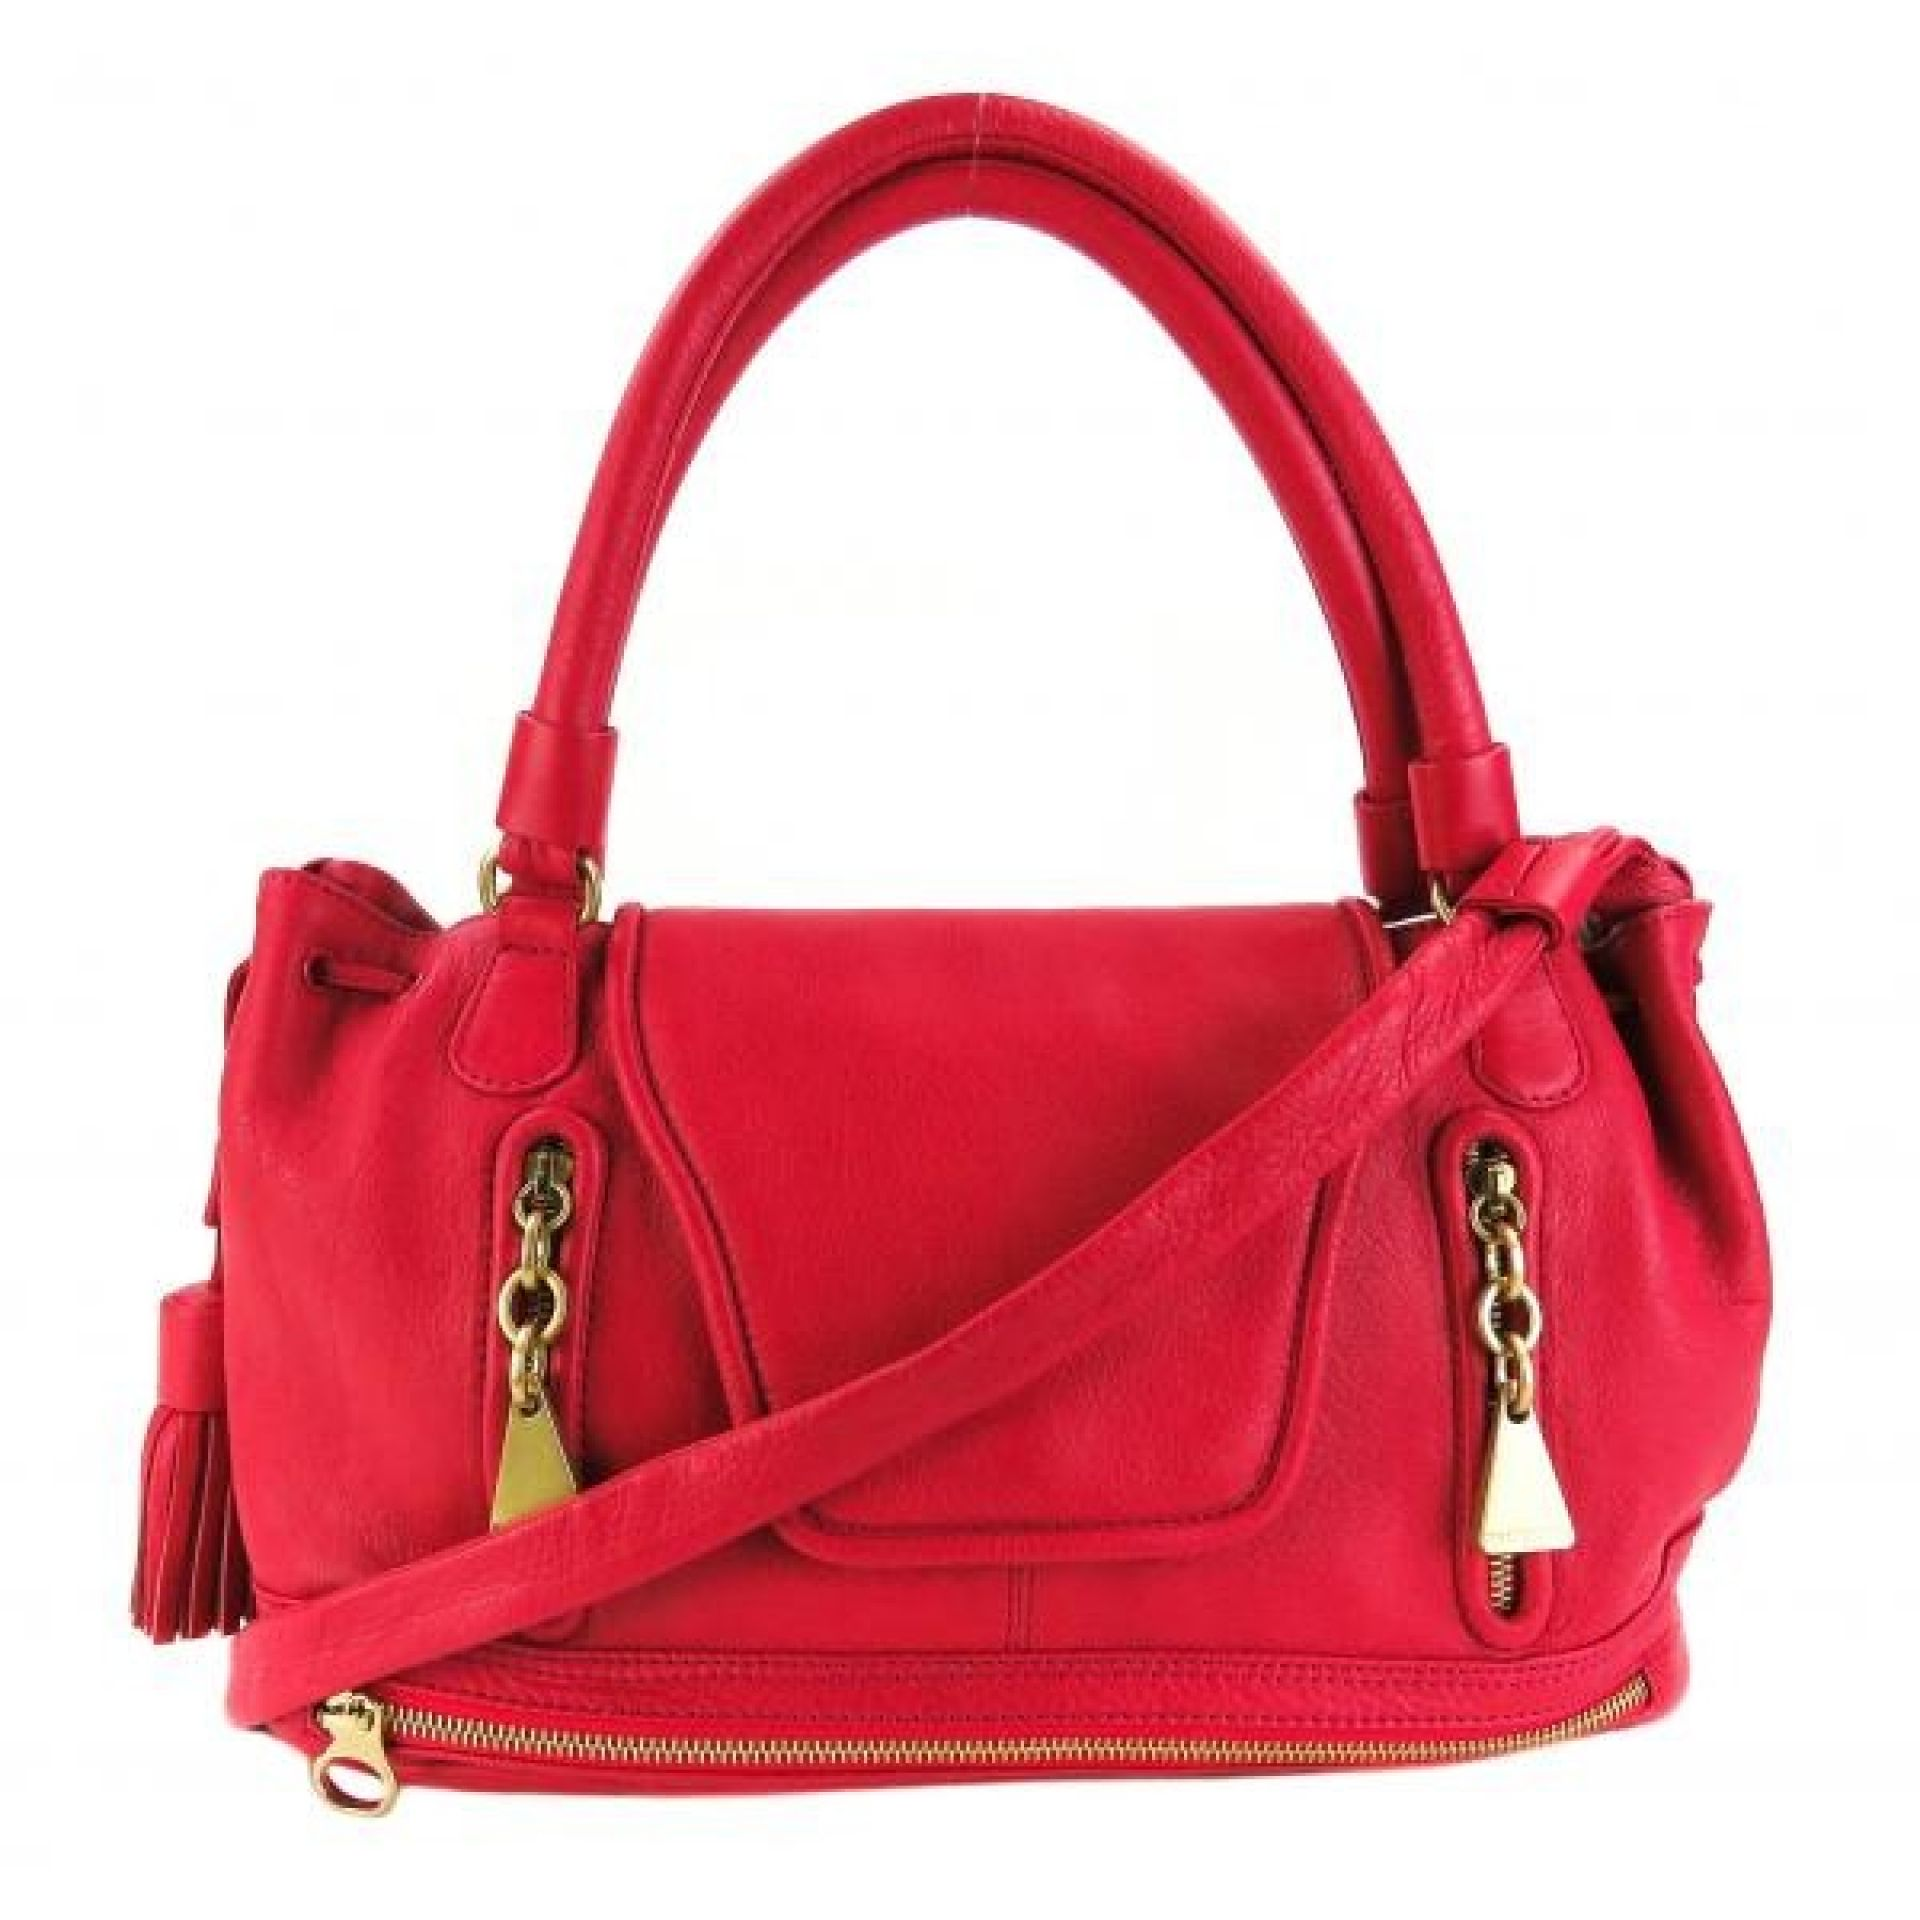 See By Chloe Pink Leather Cherry Tassel Satchel Bag